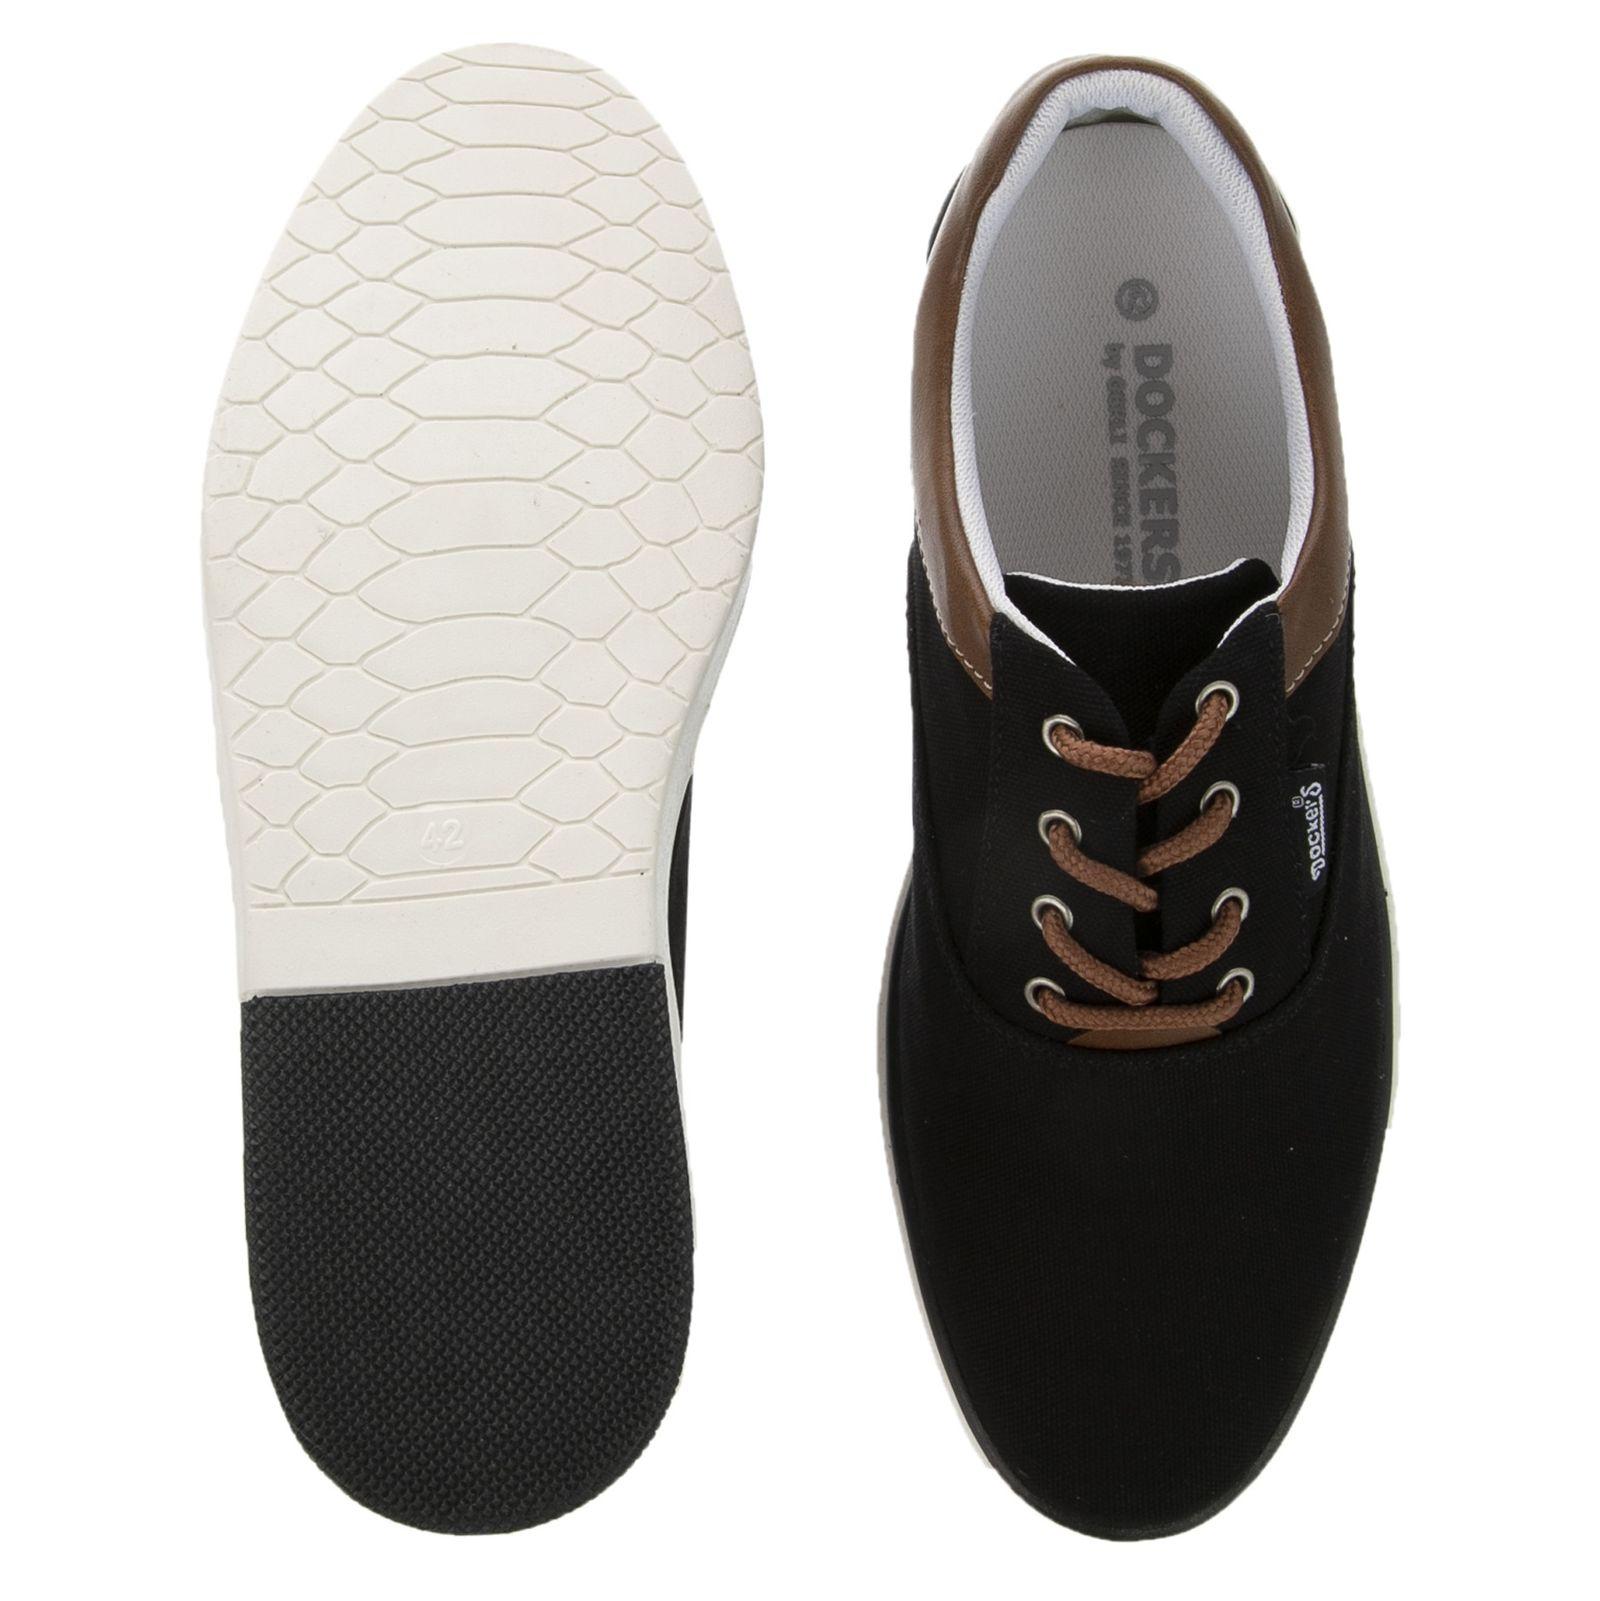 کفش روزمره مردانه داکرز مدل 100234016-BL -  - 5